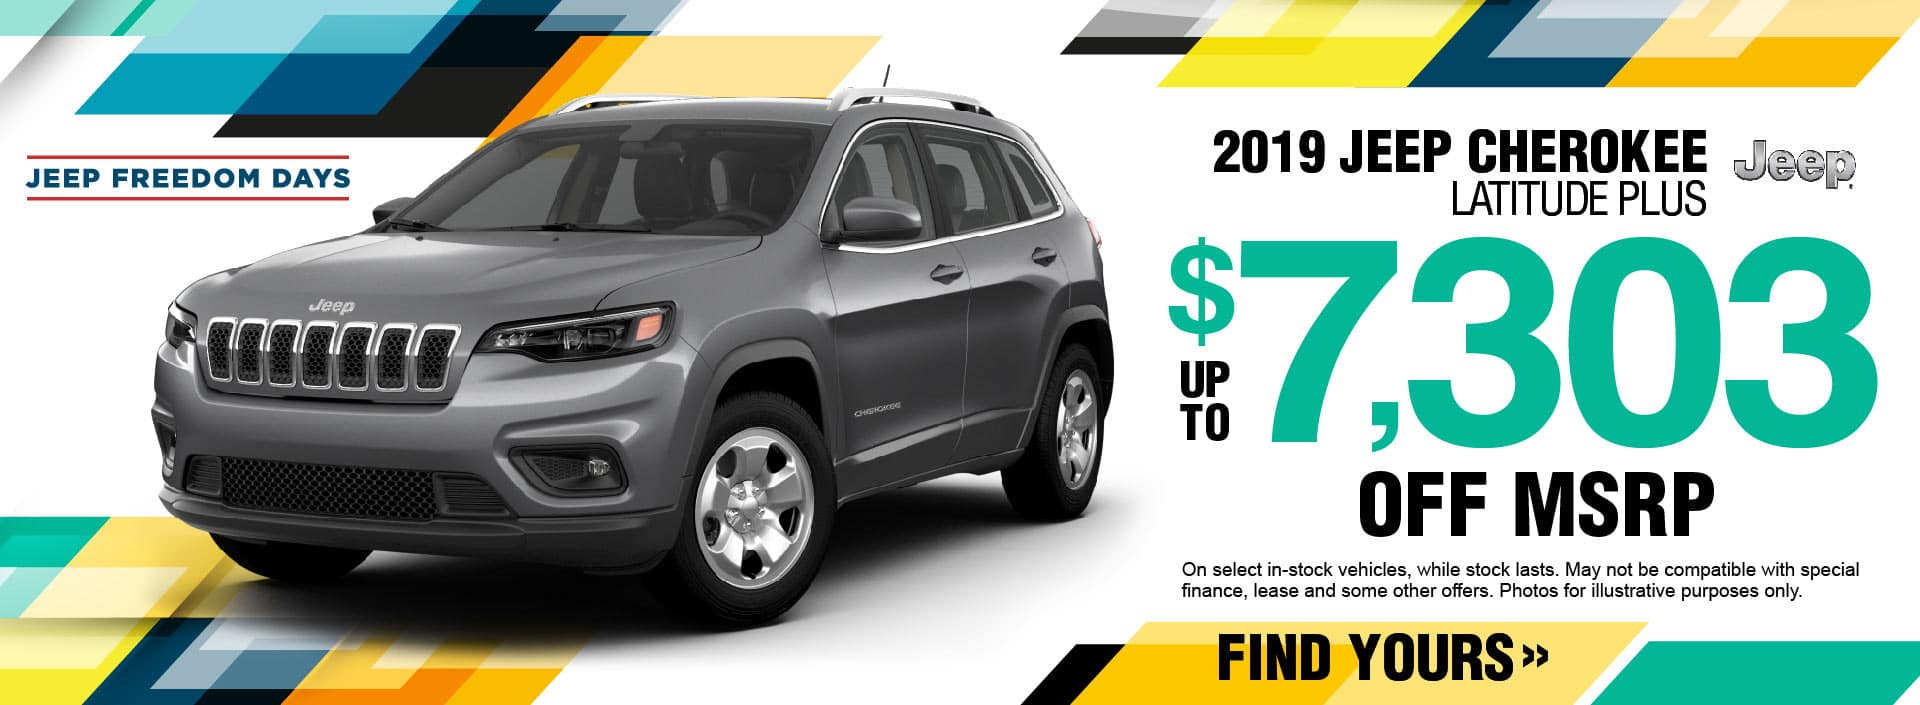 2019 Jeep Cherokee Savings